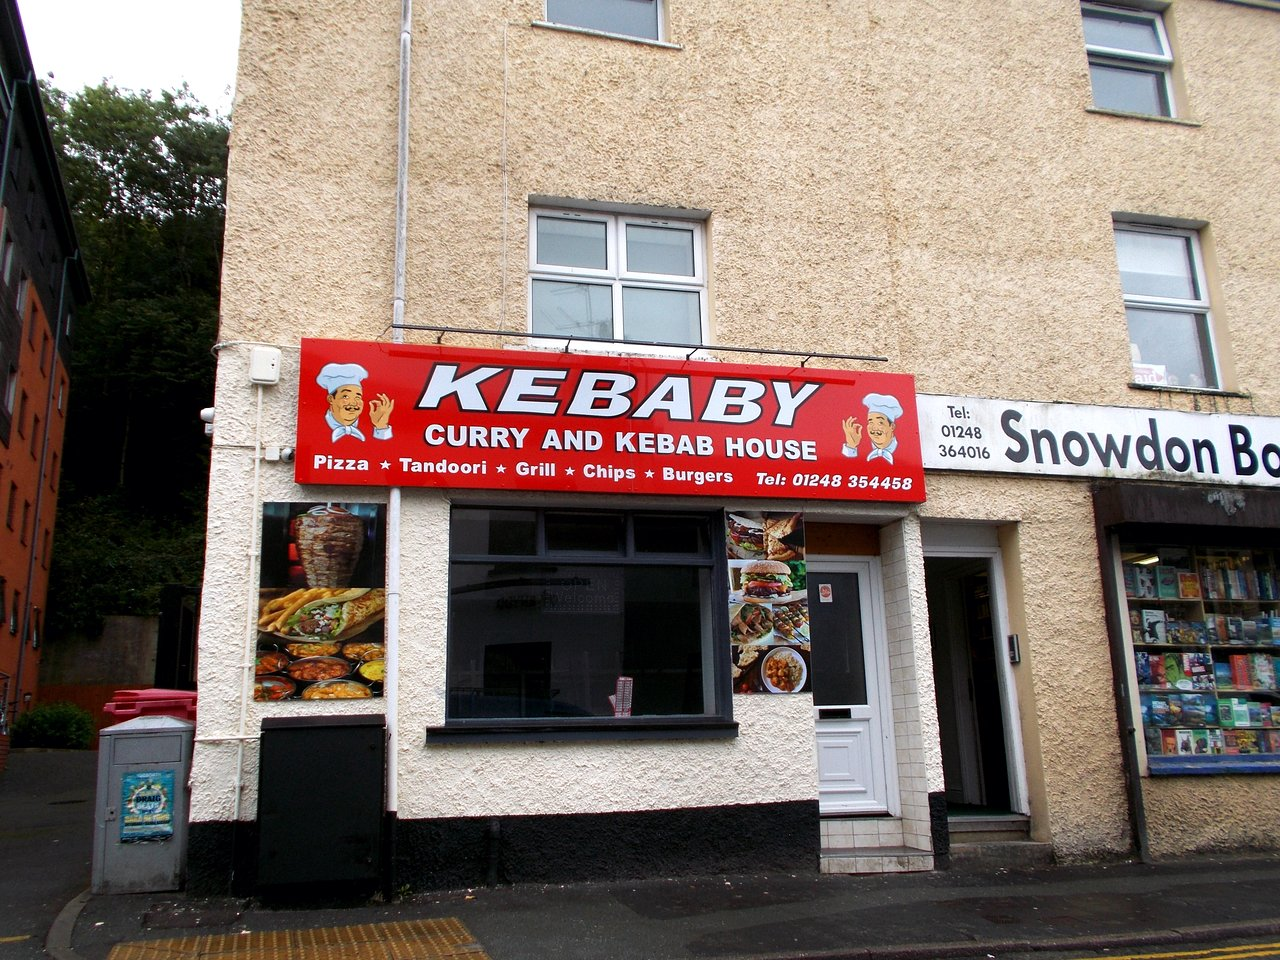 Kebaby Curry Kebab House In Bangor Original Menus